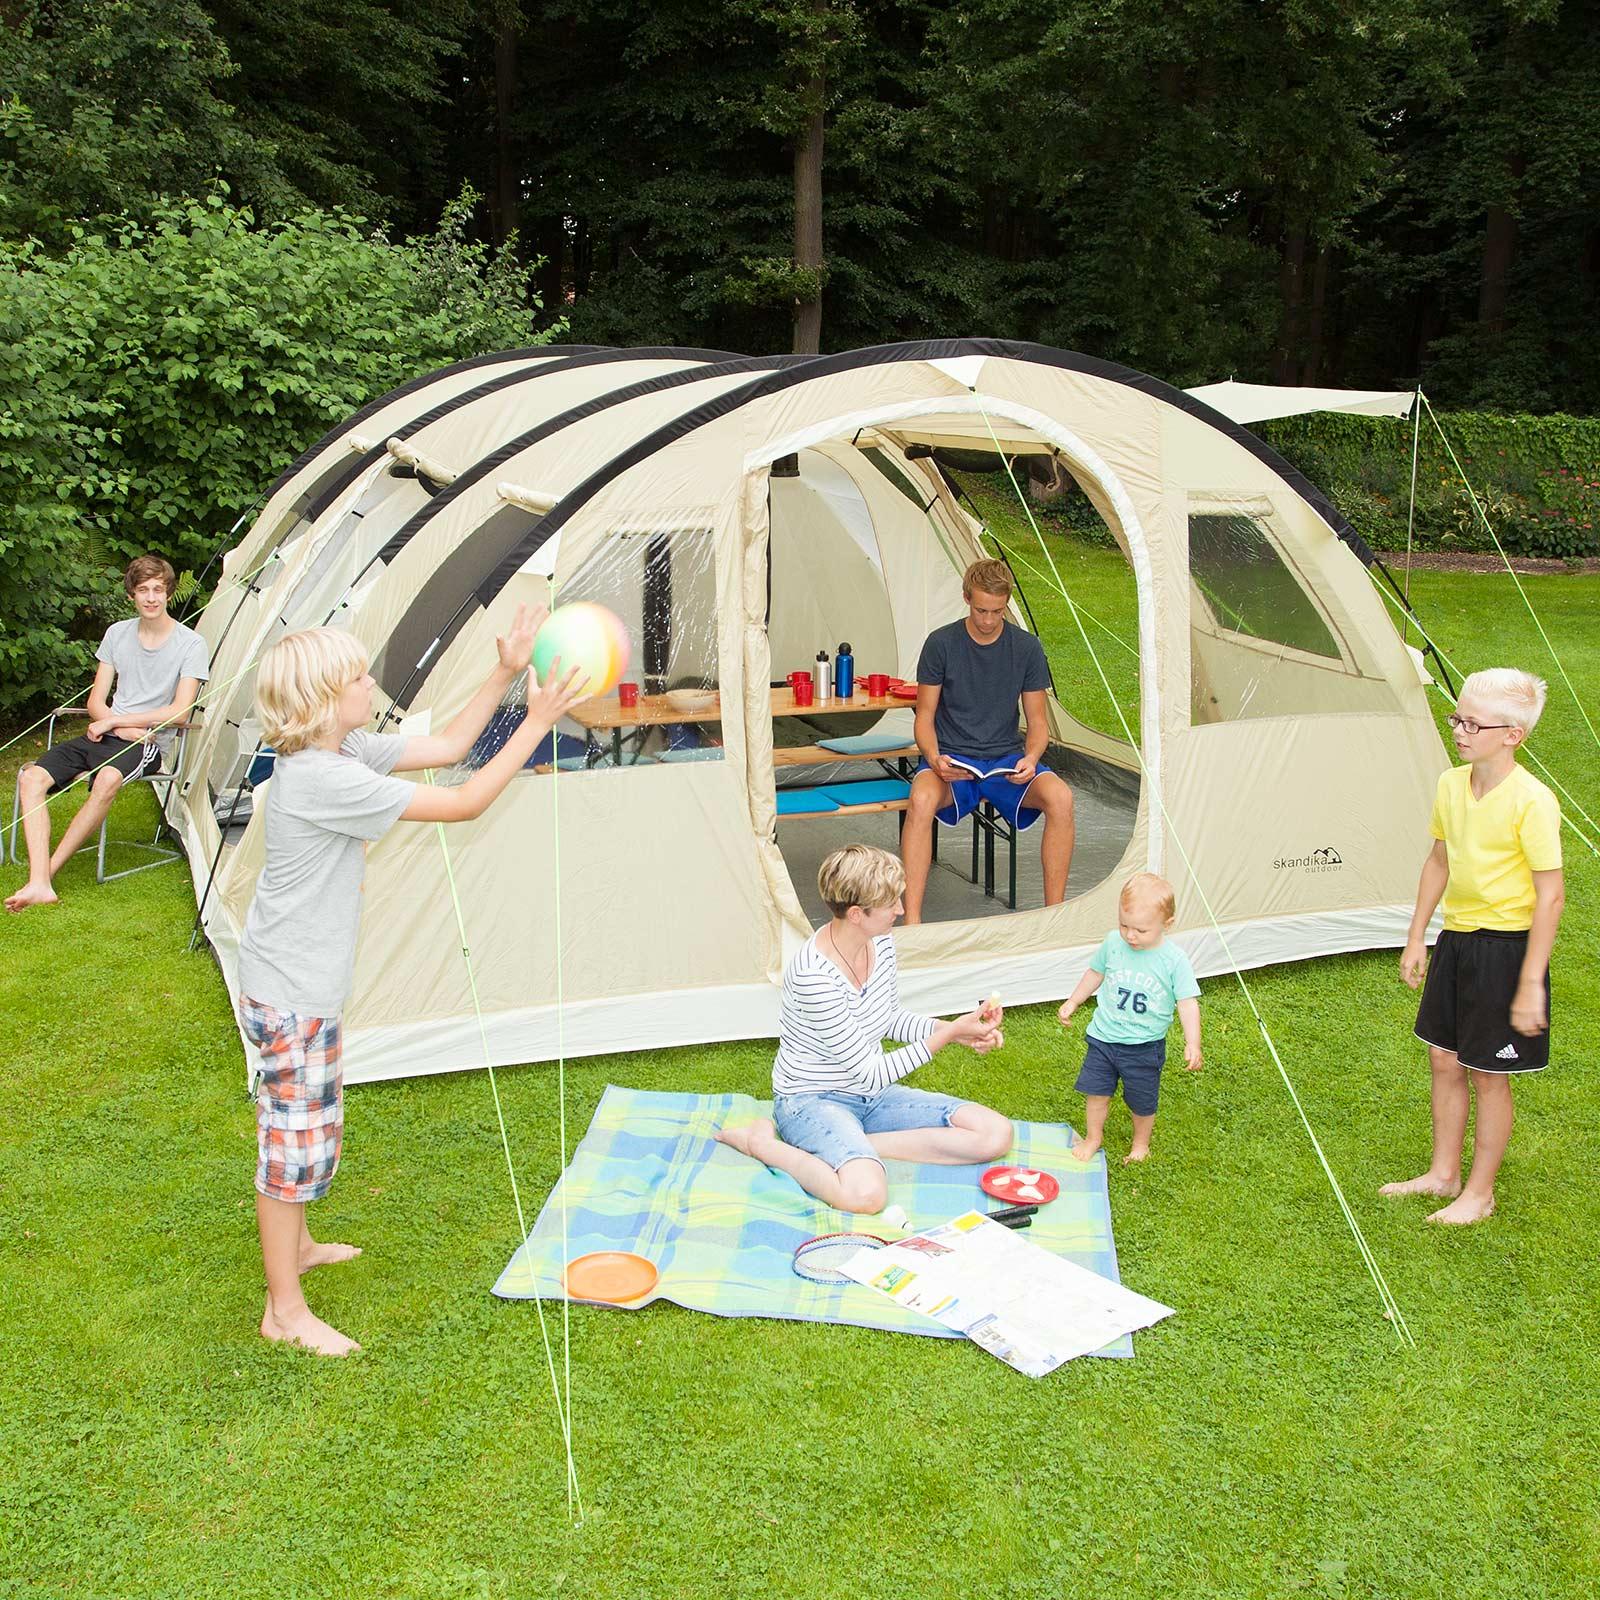 skandika gotland 6 pers tente camping tunnel familiale. Black Bedroom Furniture Sets. Home Design Ideas